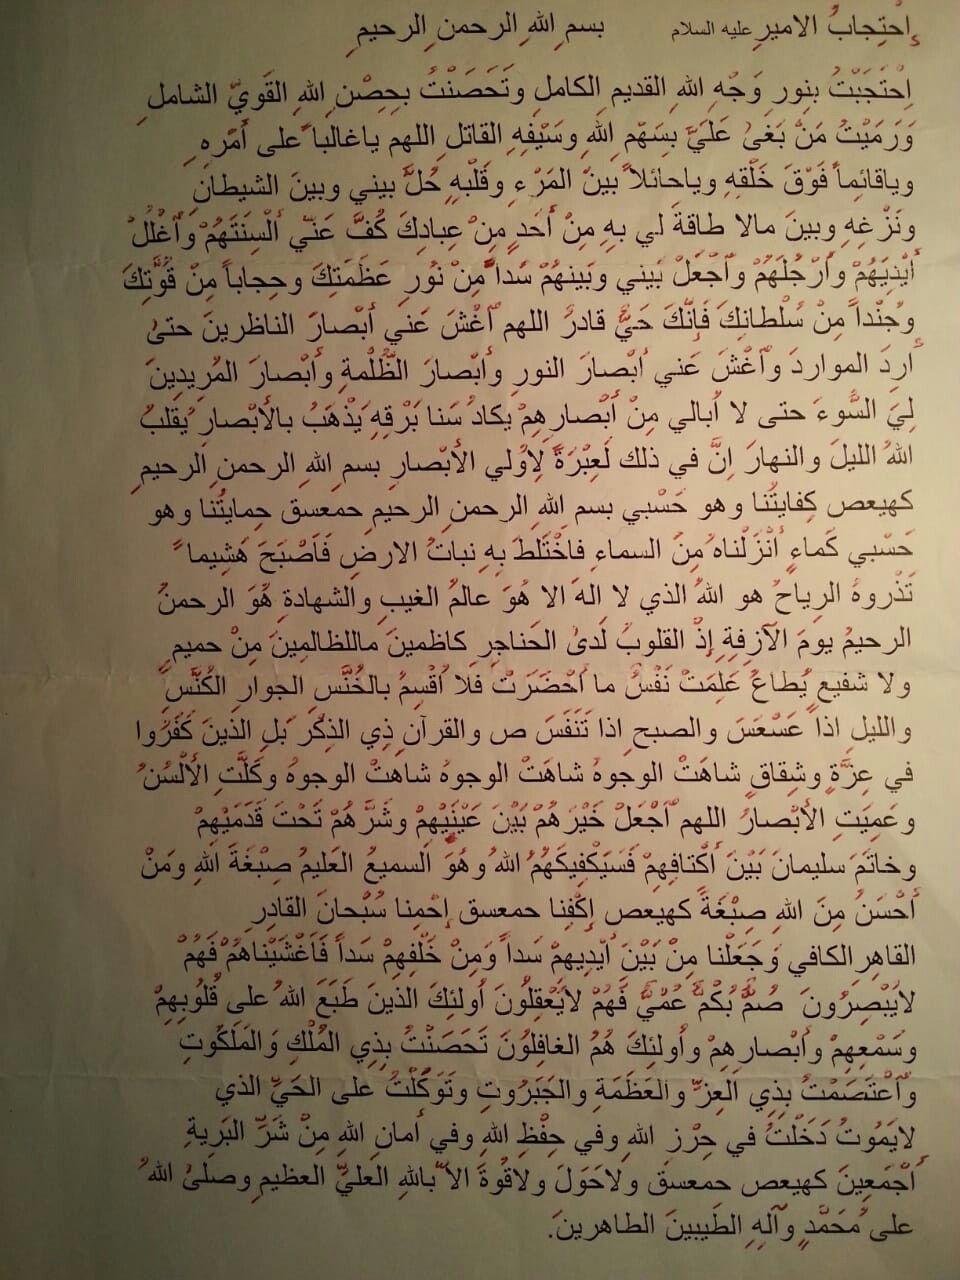 Pin By محمد رضا محمد رضا On احتجاب الامير عليه السلام يقرأ عند شروق والغروب Places To Visit Sheet Music